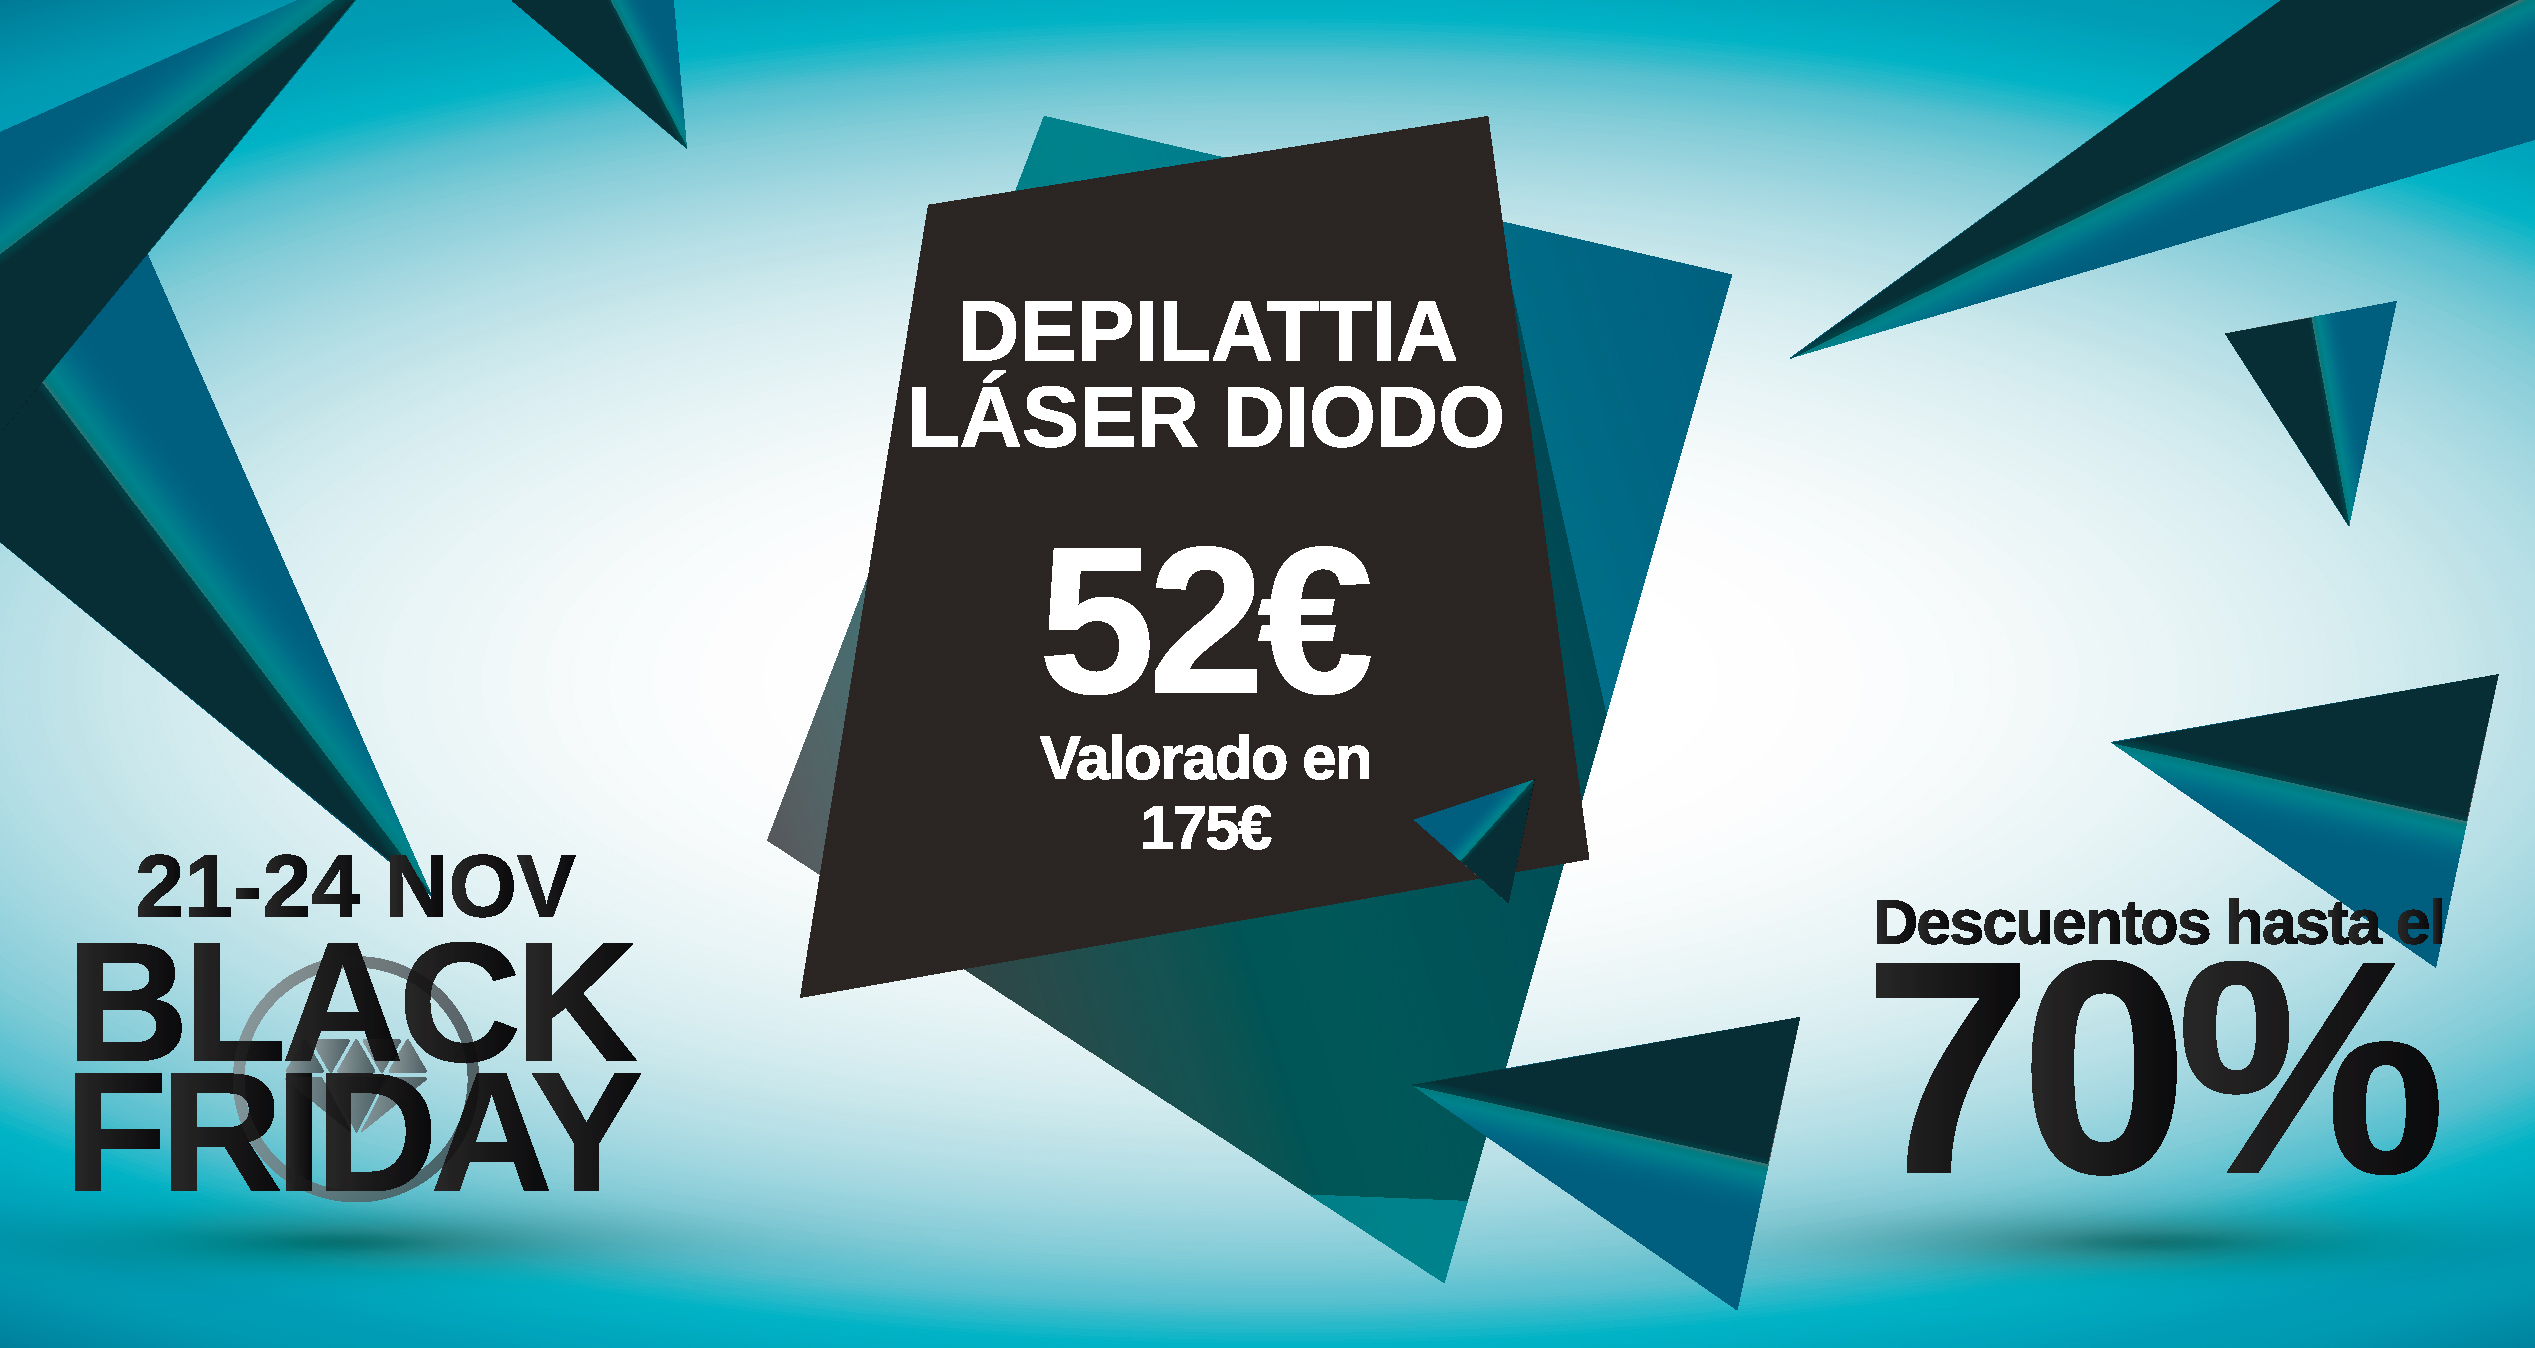 AAFF-Black-friday-depilattia-spa_laser-diodo-FACEBOOK